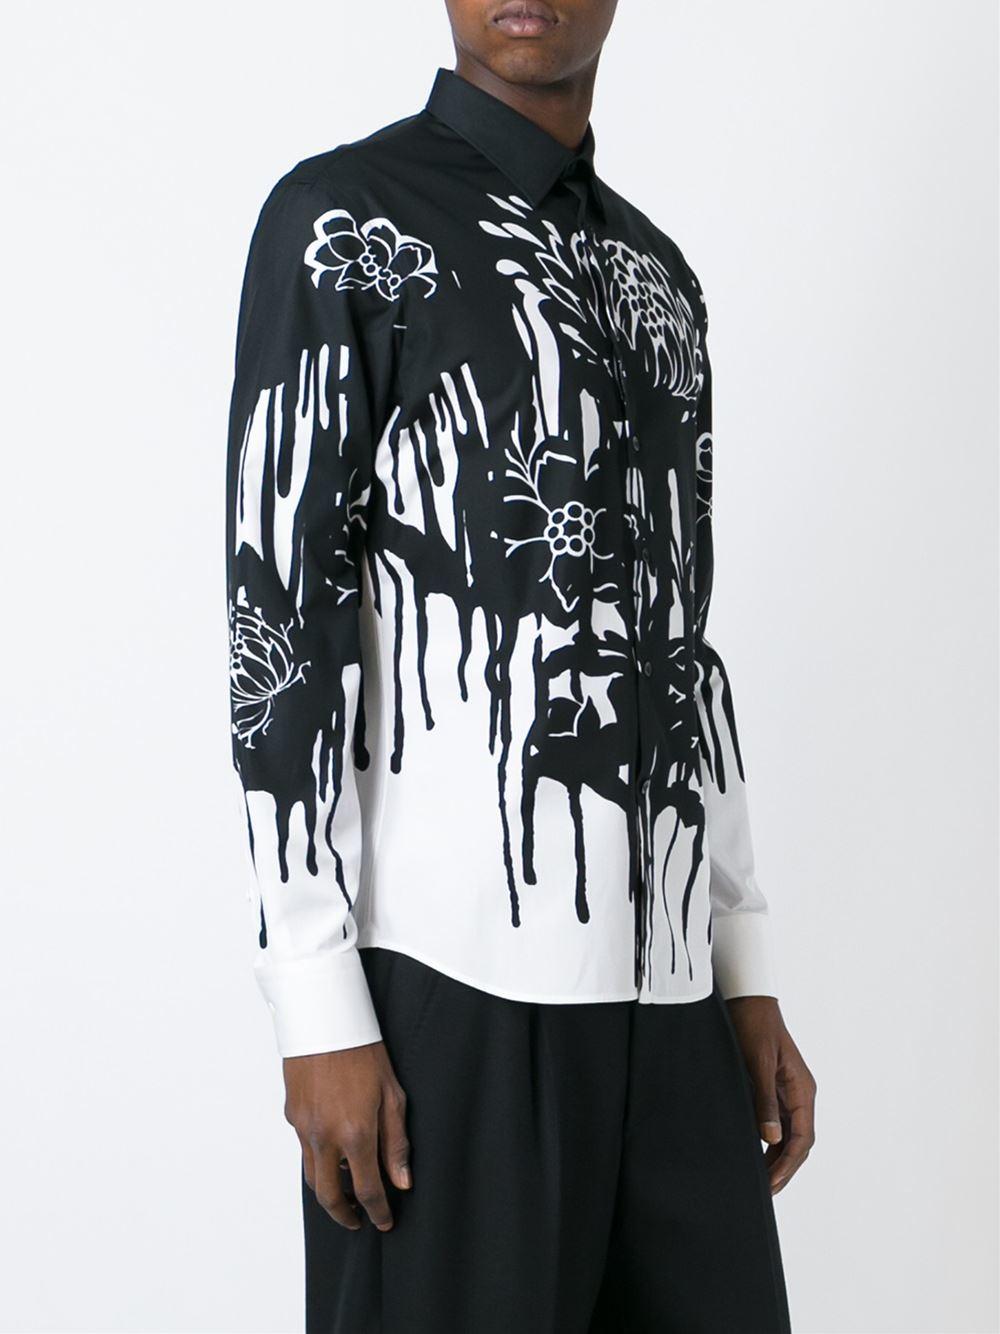 Alexander Mcqueen Floral Drip Print Shirt In Black For Men